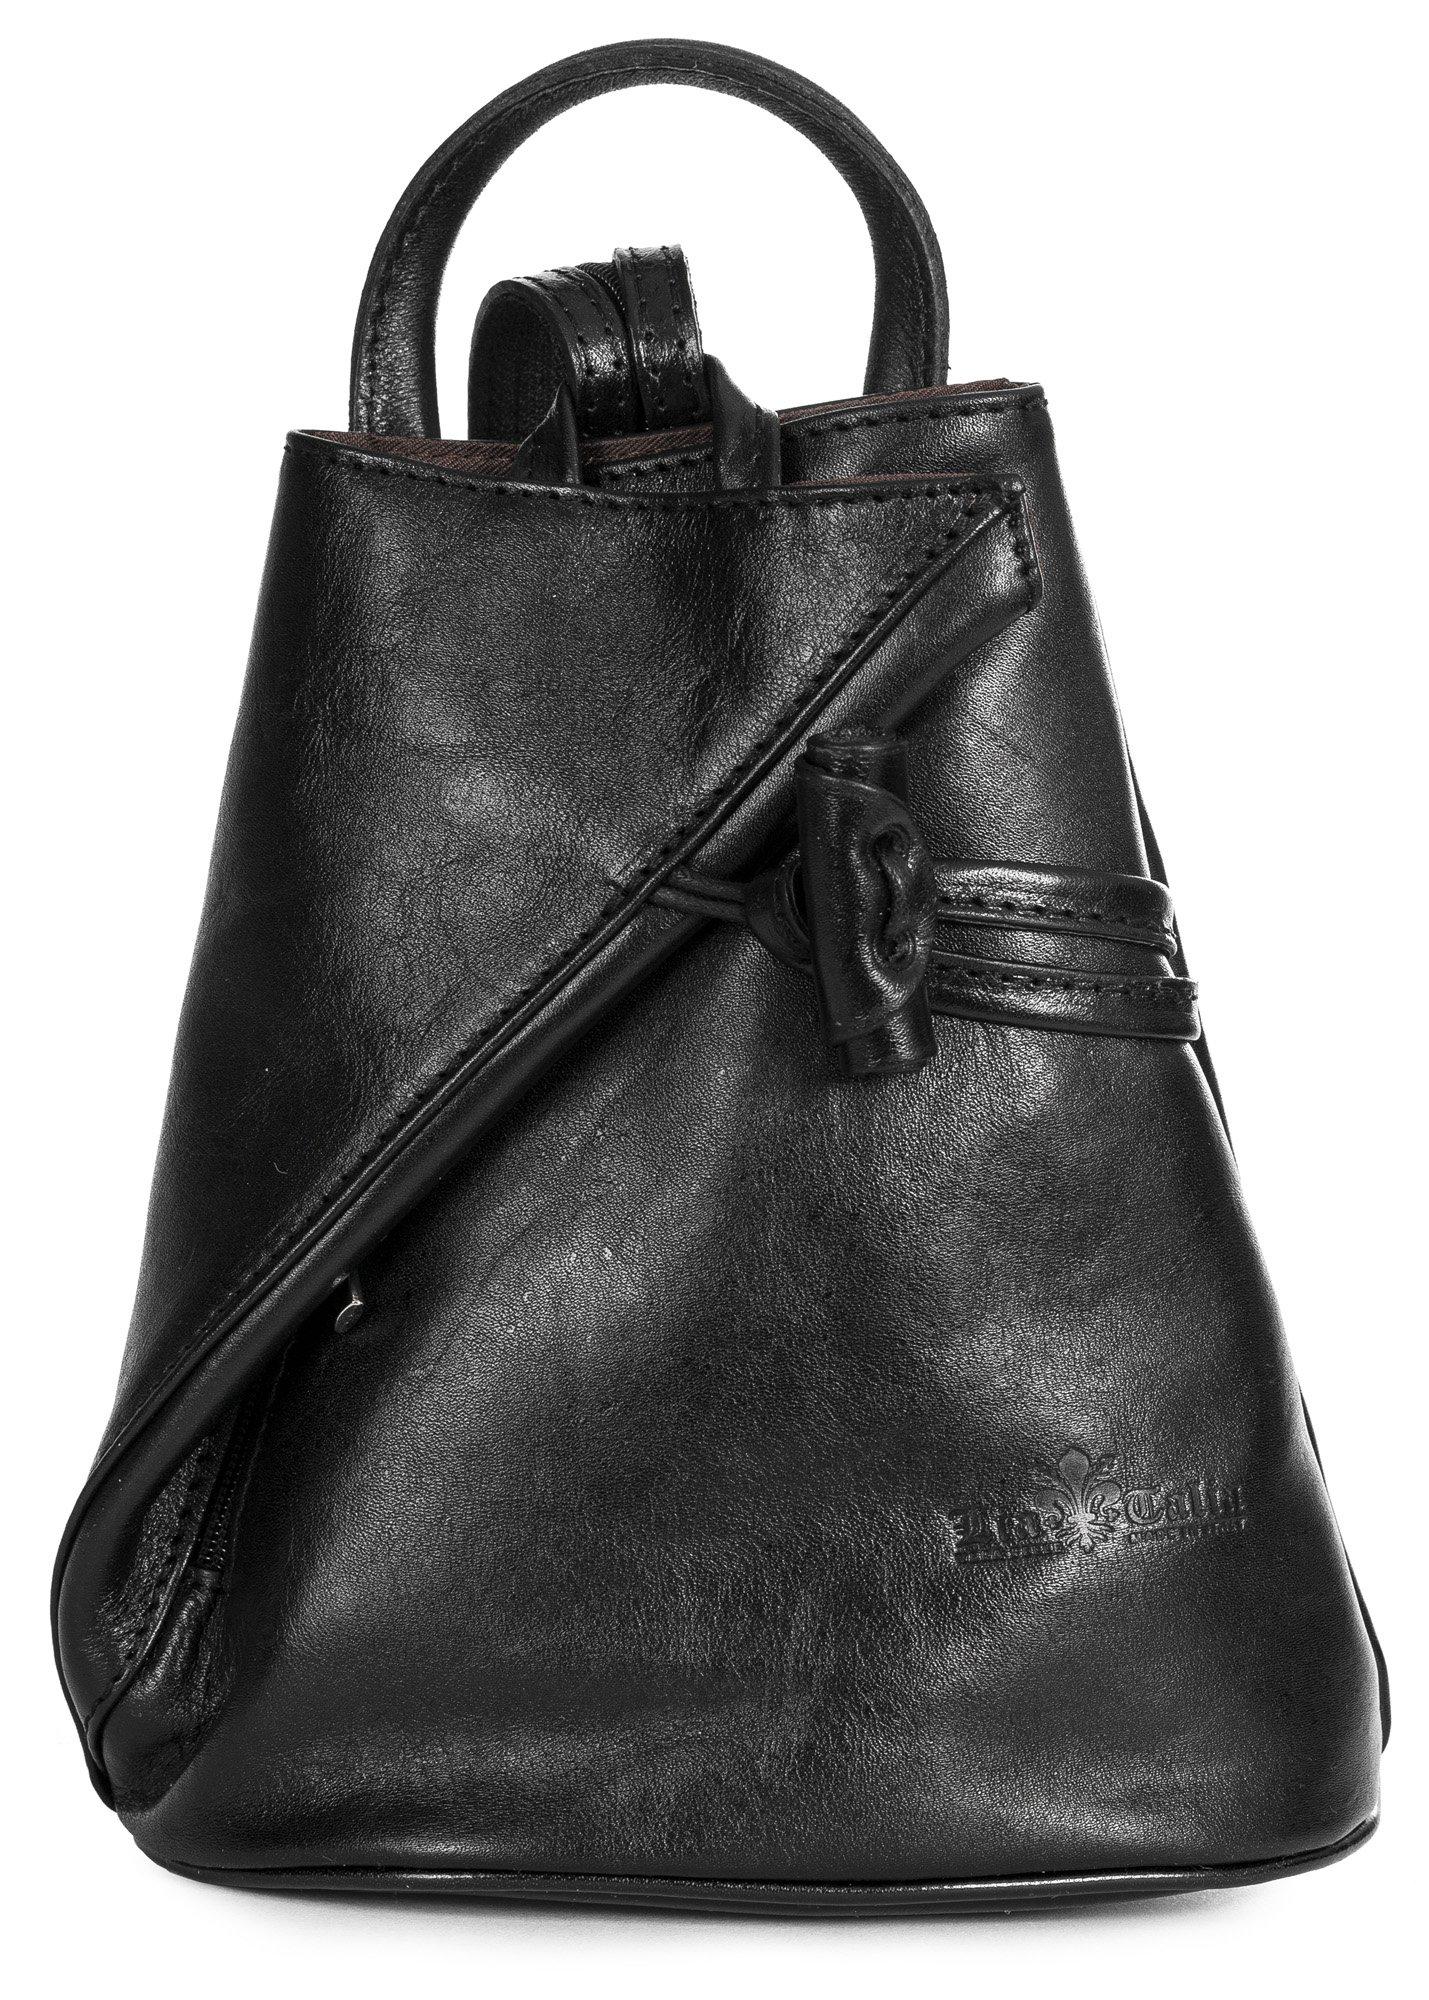 LiaTalia Vera Pelle Made In Italy Brady byLiaTalia Womens Mens Adult Convertible Strap Italian Leather Backpack Rucksack Duffle Shoulder Bag Handbag (Large/Medium - Black Plain)